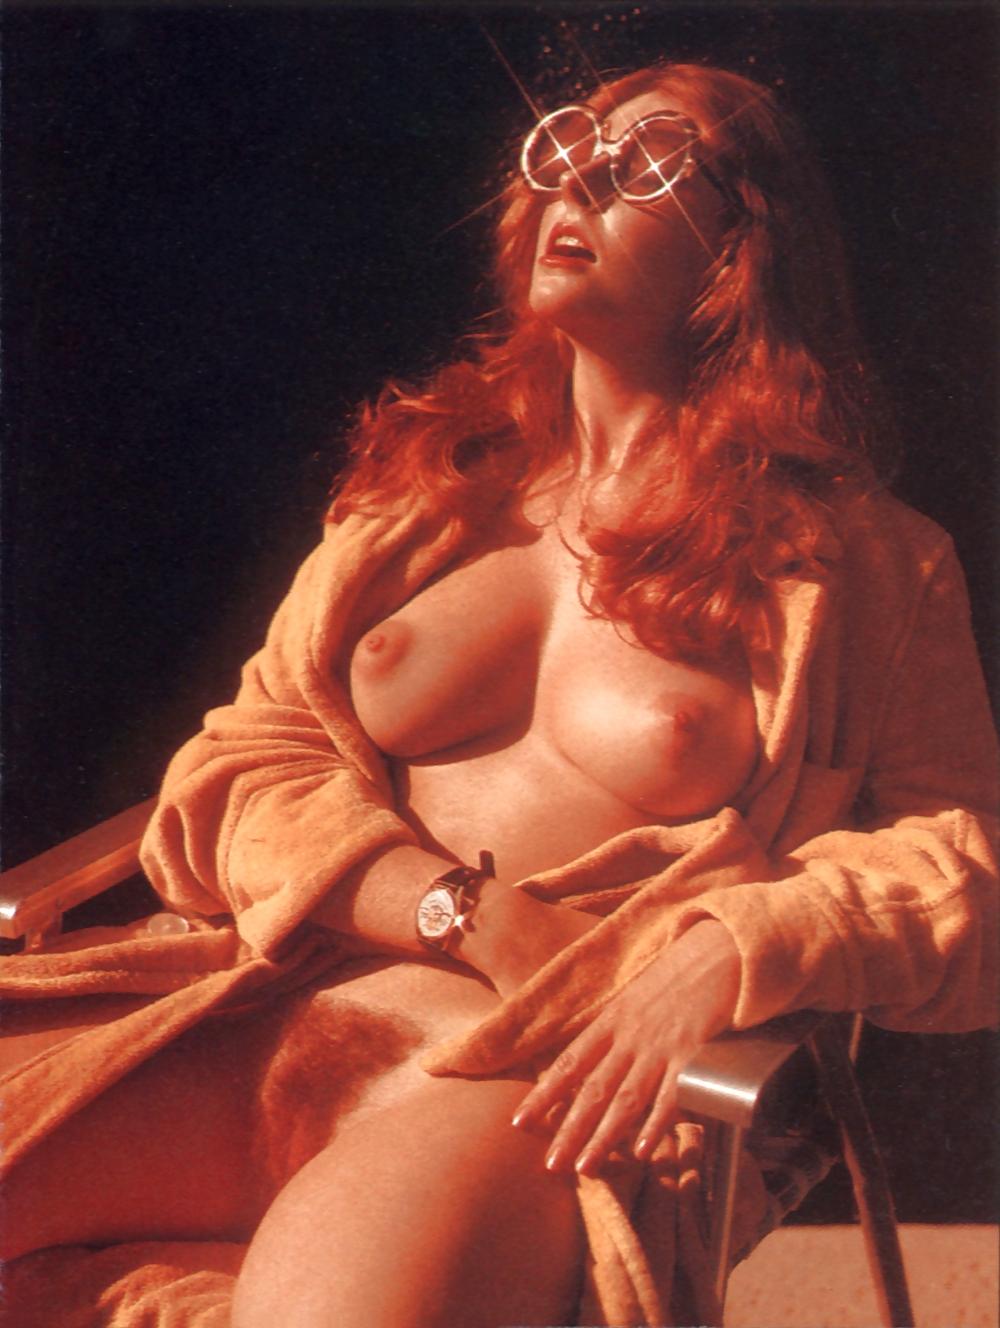 Cassandra Peterson Tits